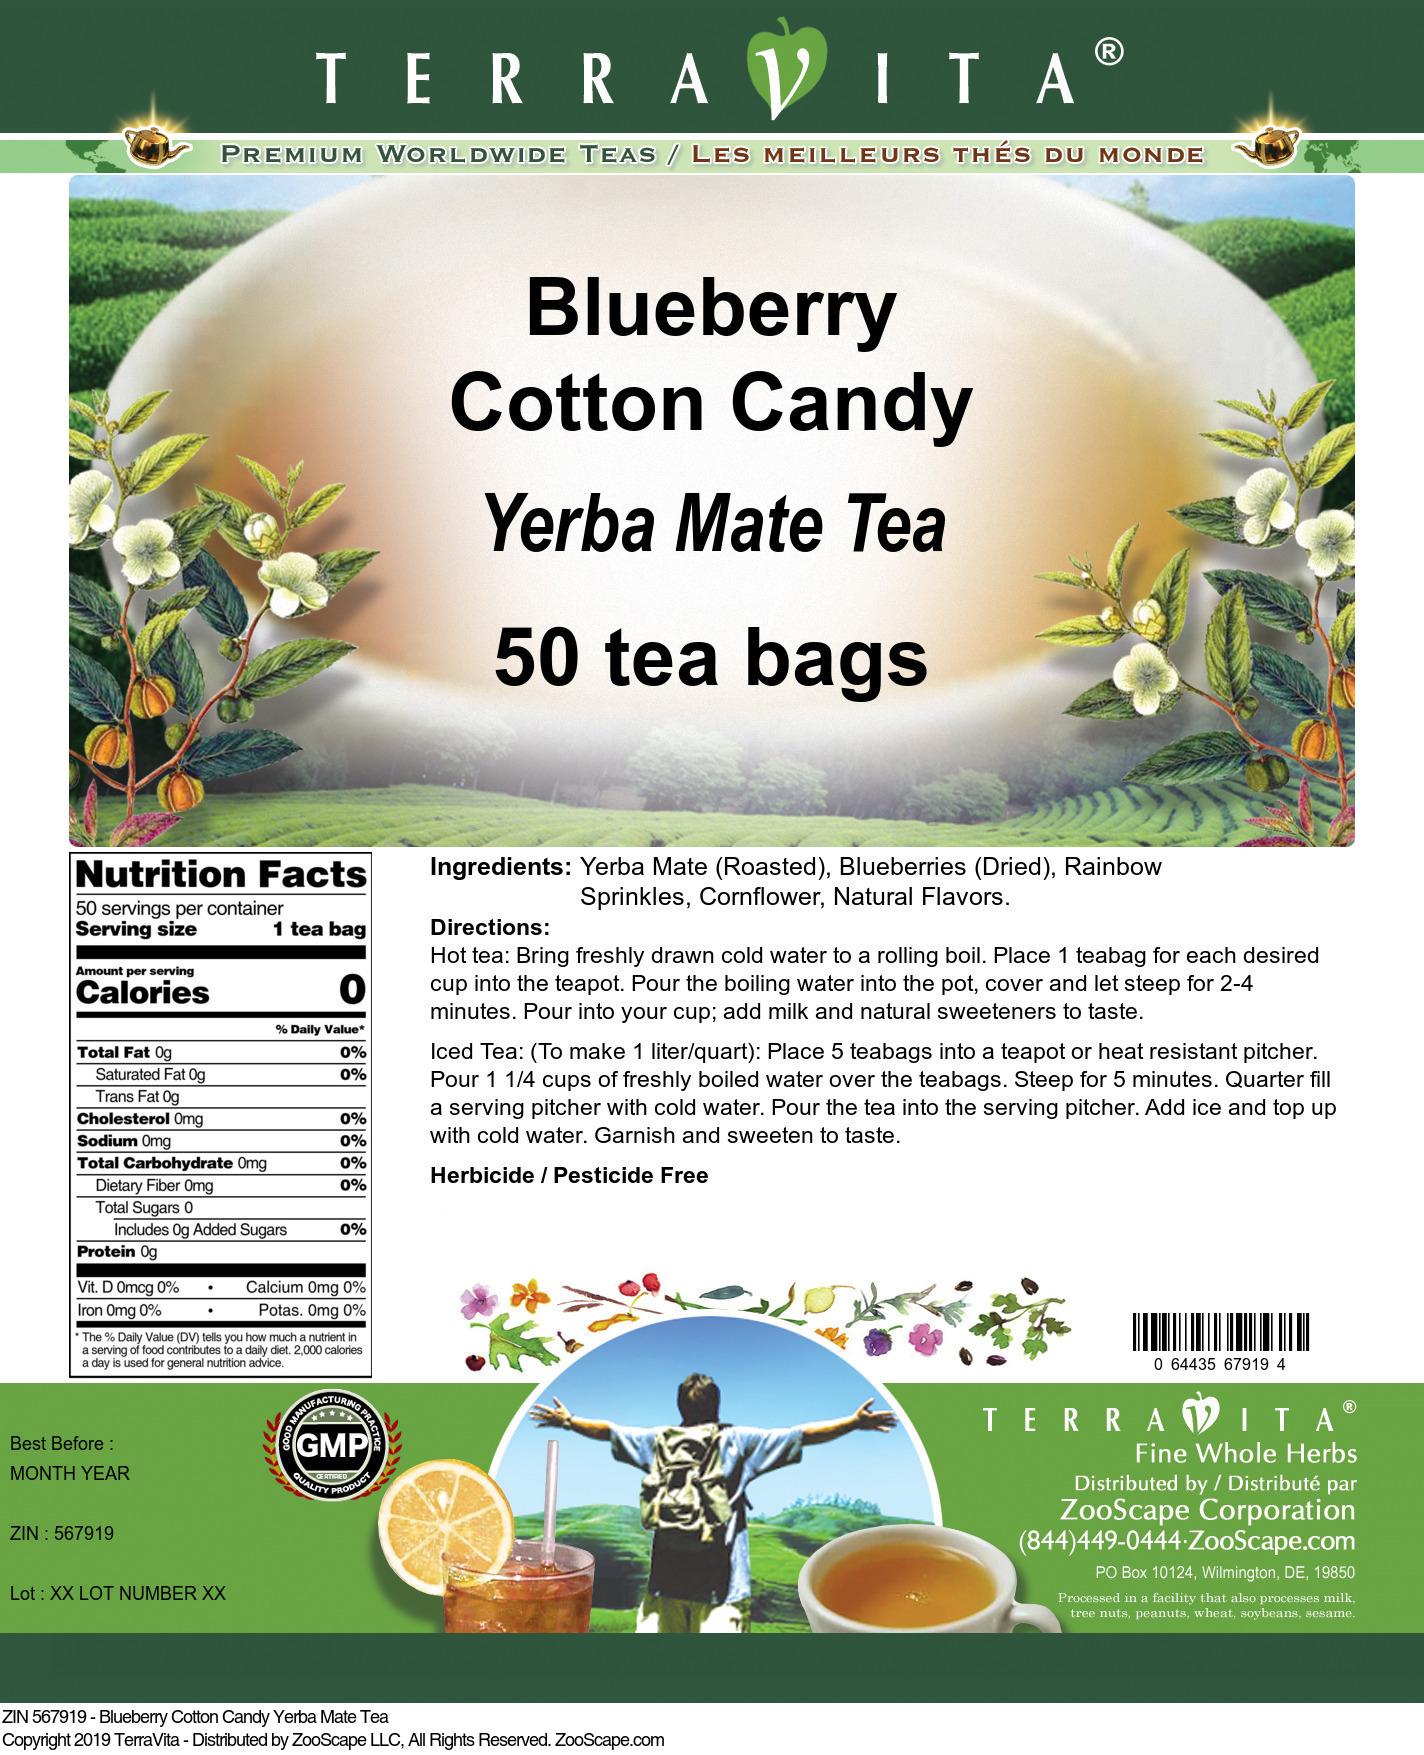 Blueberry Cotton Candy Yerba Mate Tea